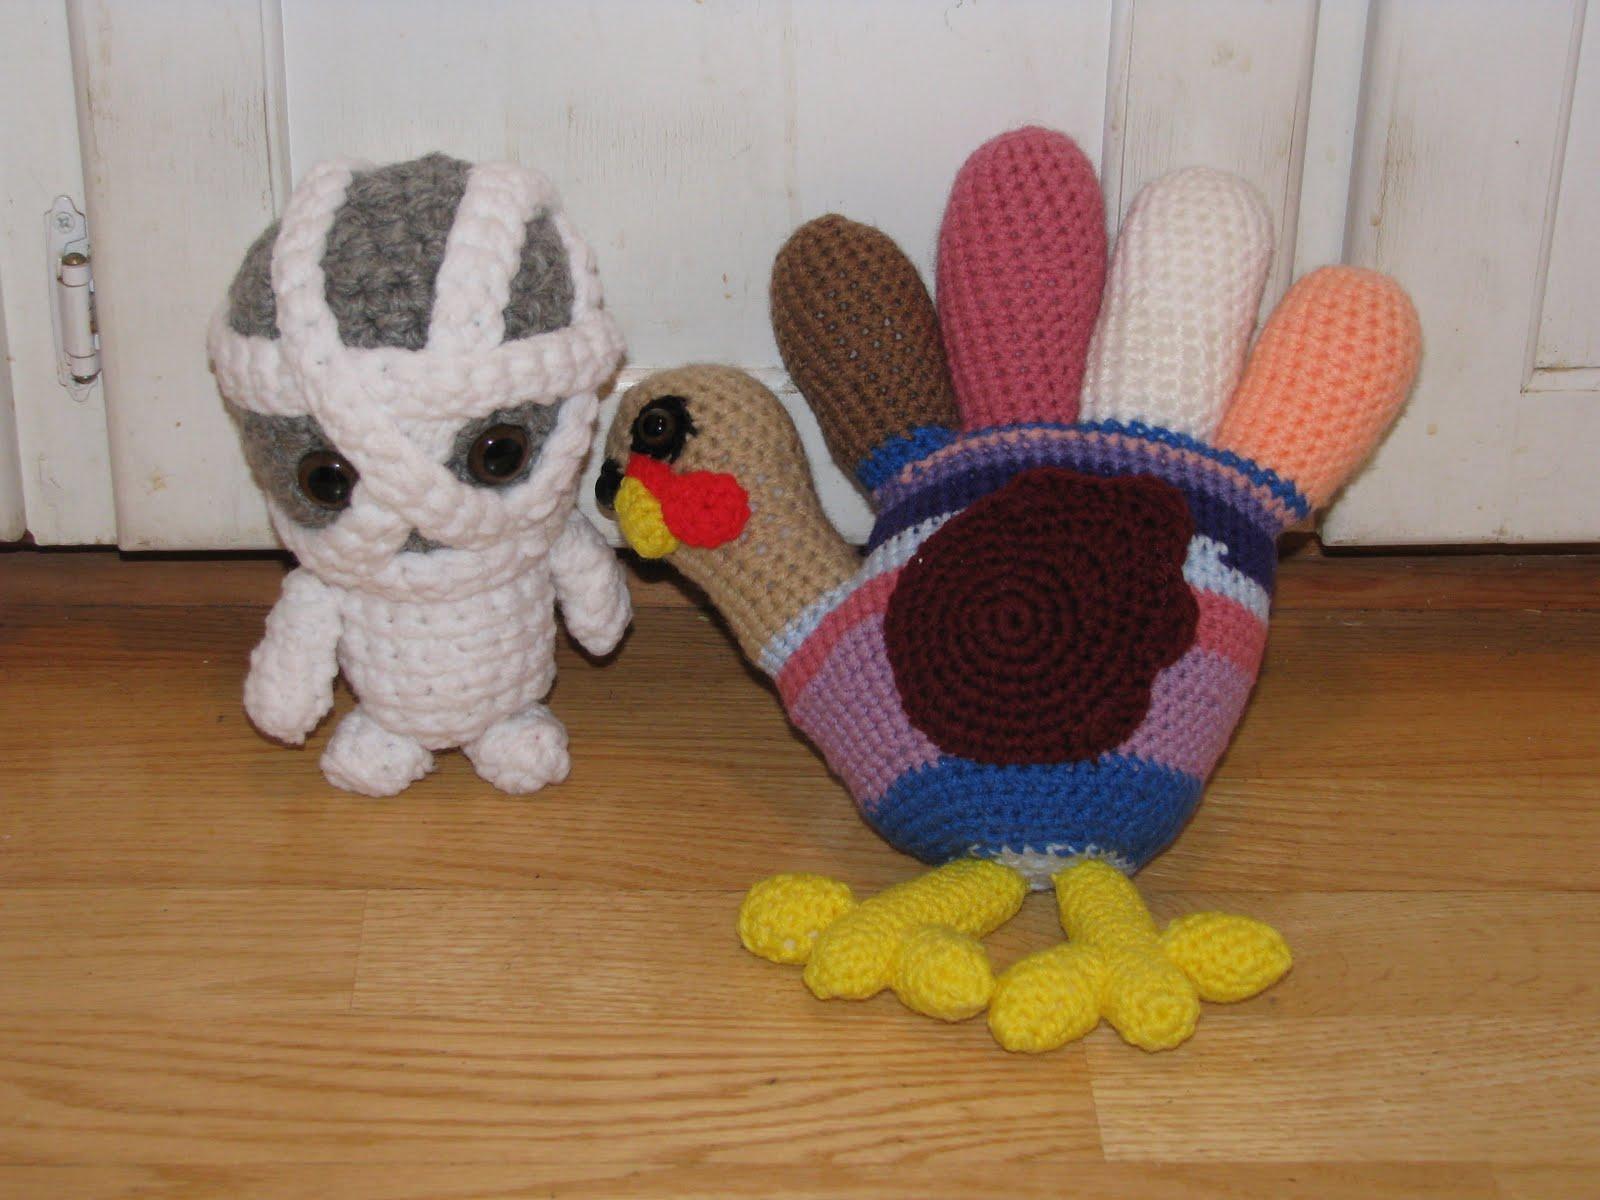 Gourmet Crochet Amigurumi Dinosaurs : Craft Attic Resources: September 2011